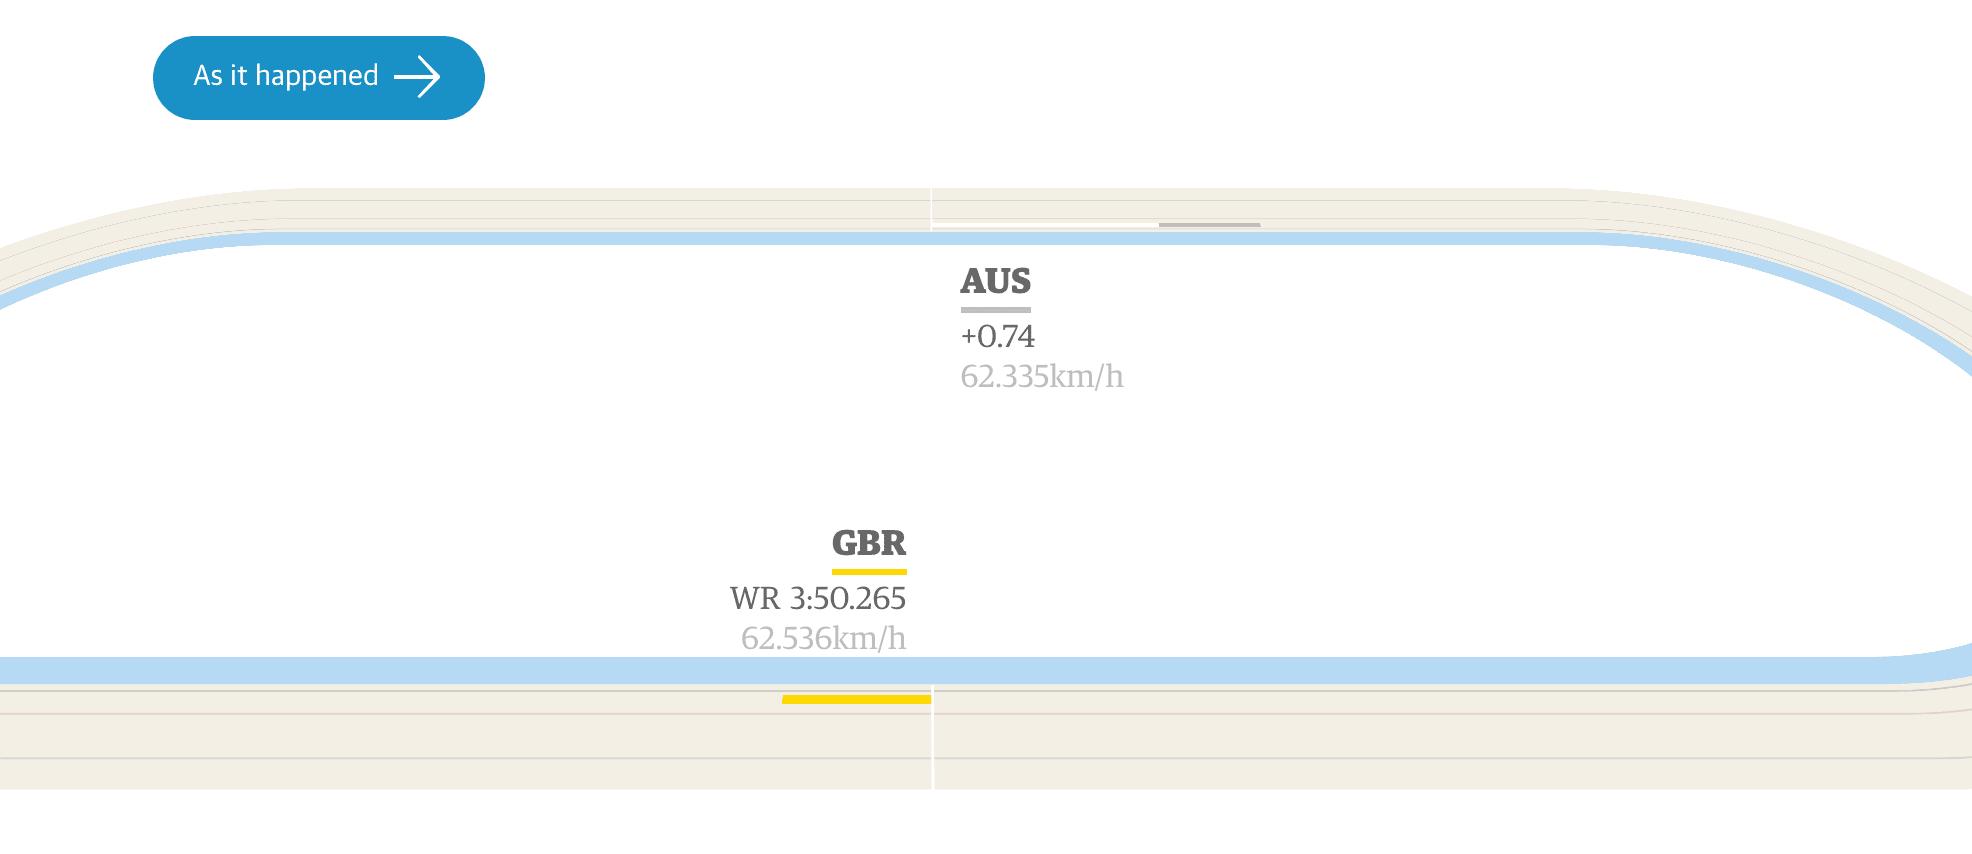 data story the guardian great britain olympics rio